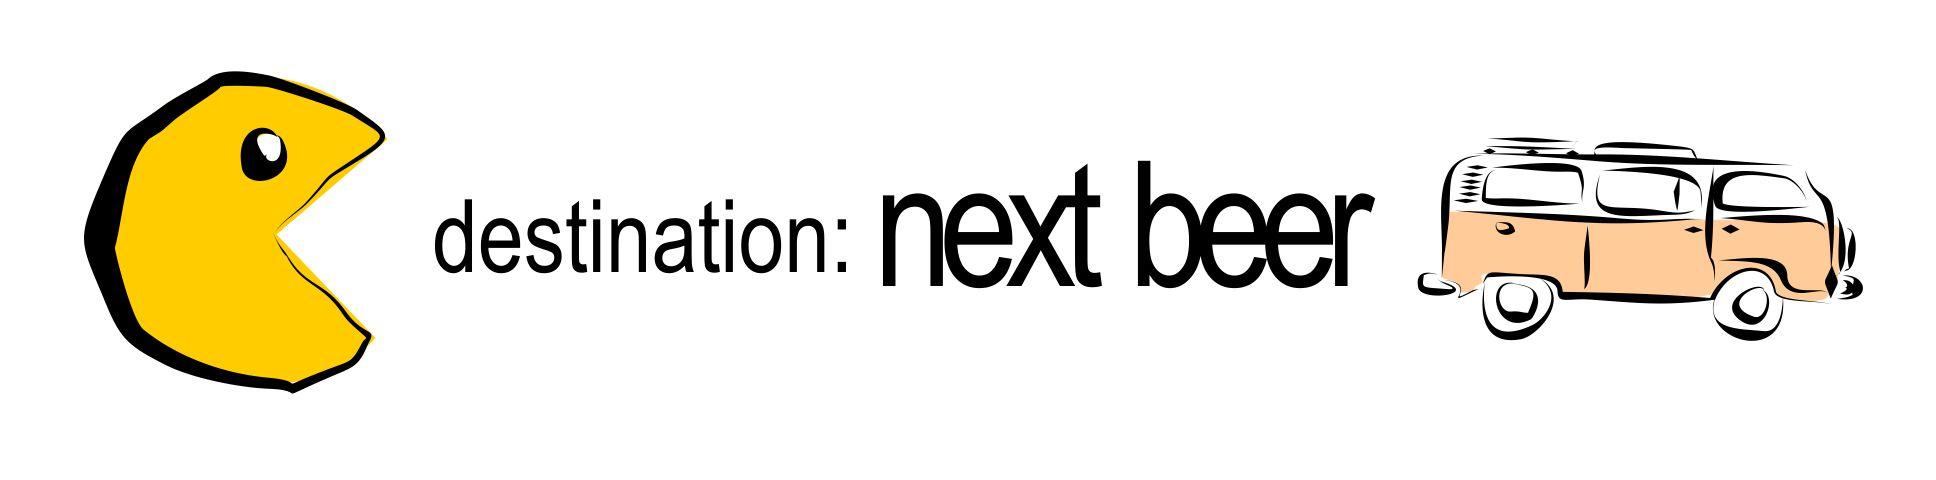 nextbeer